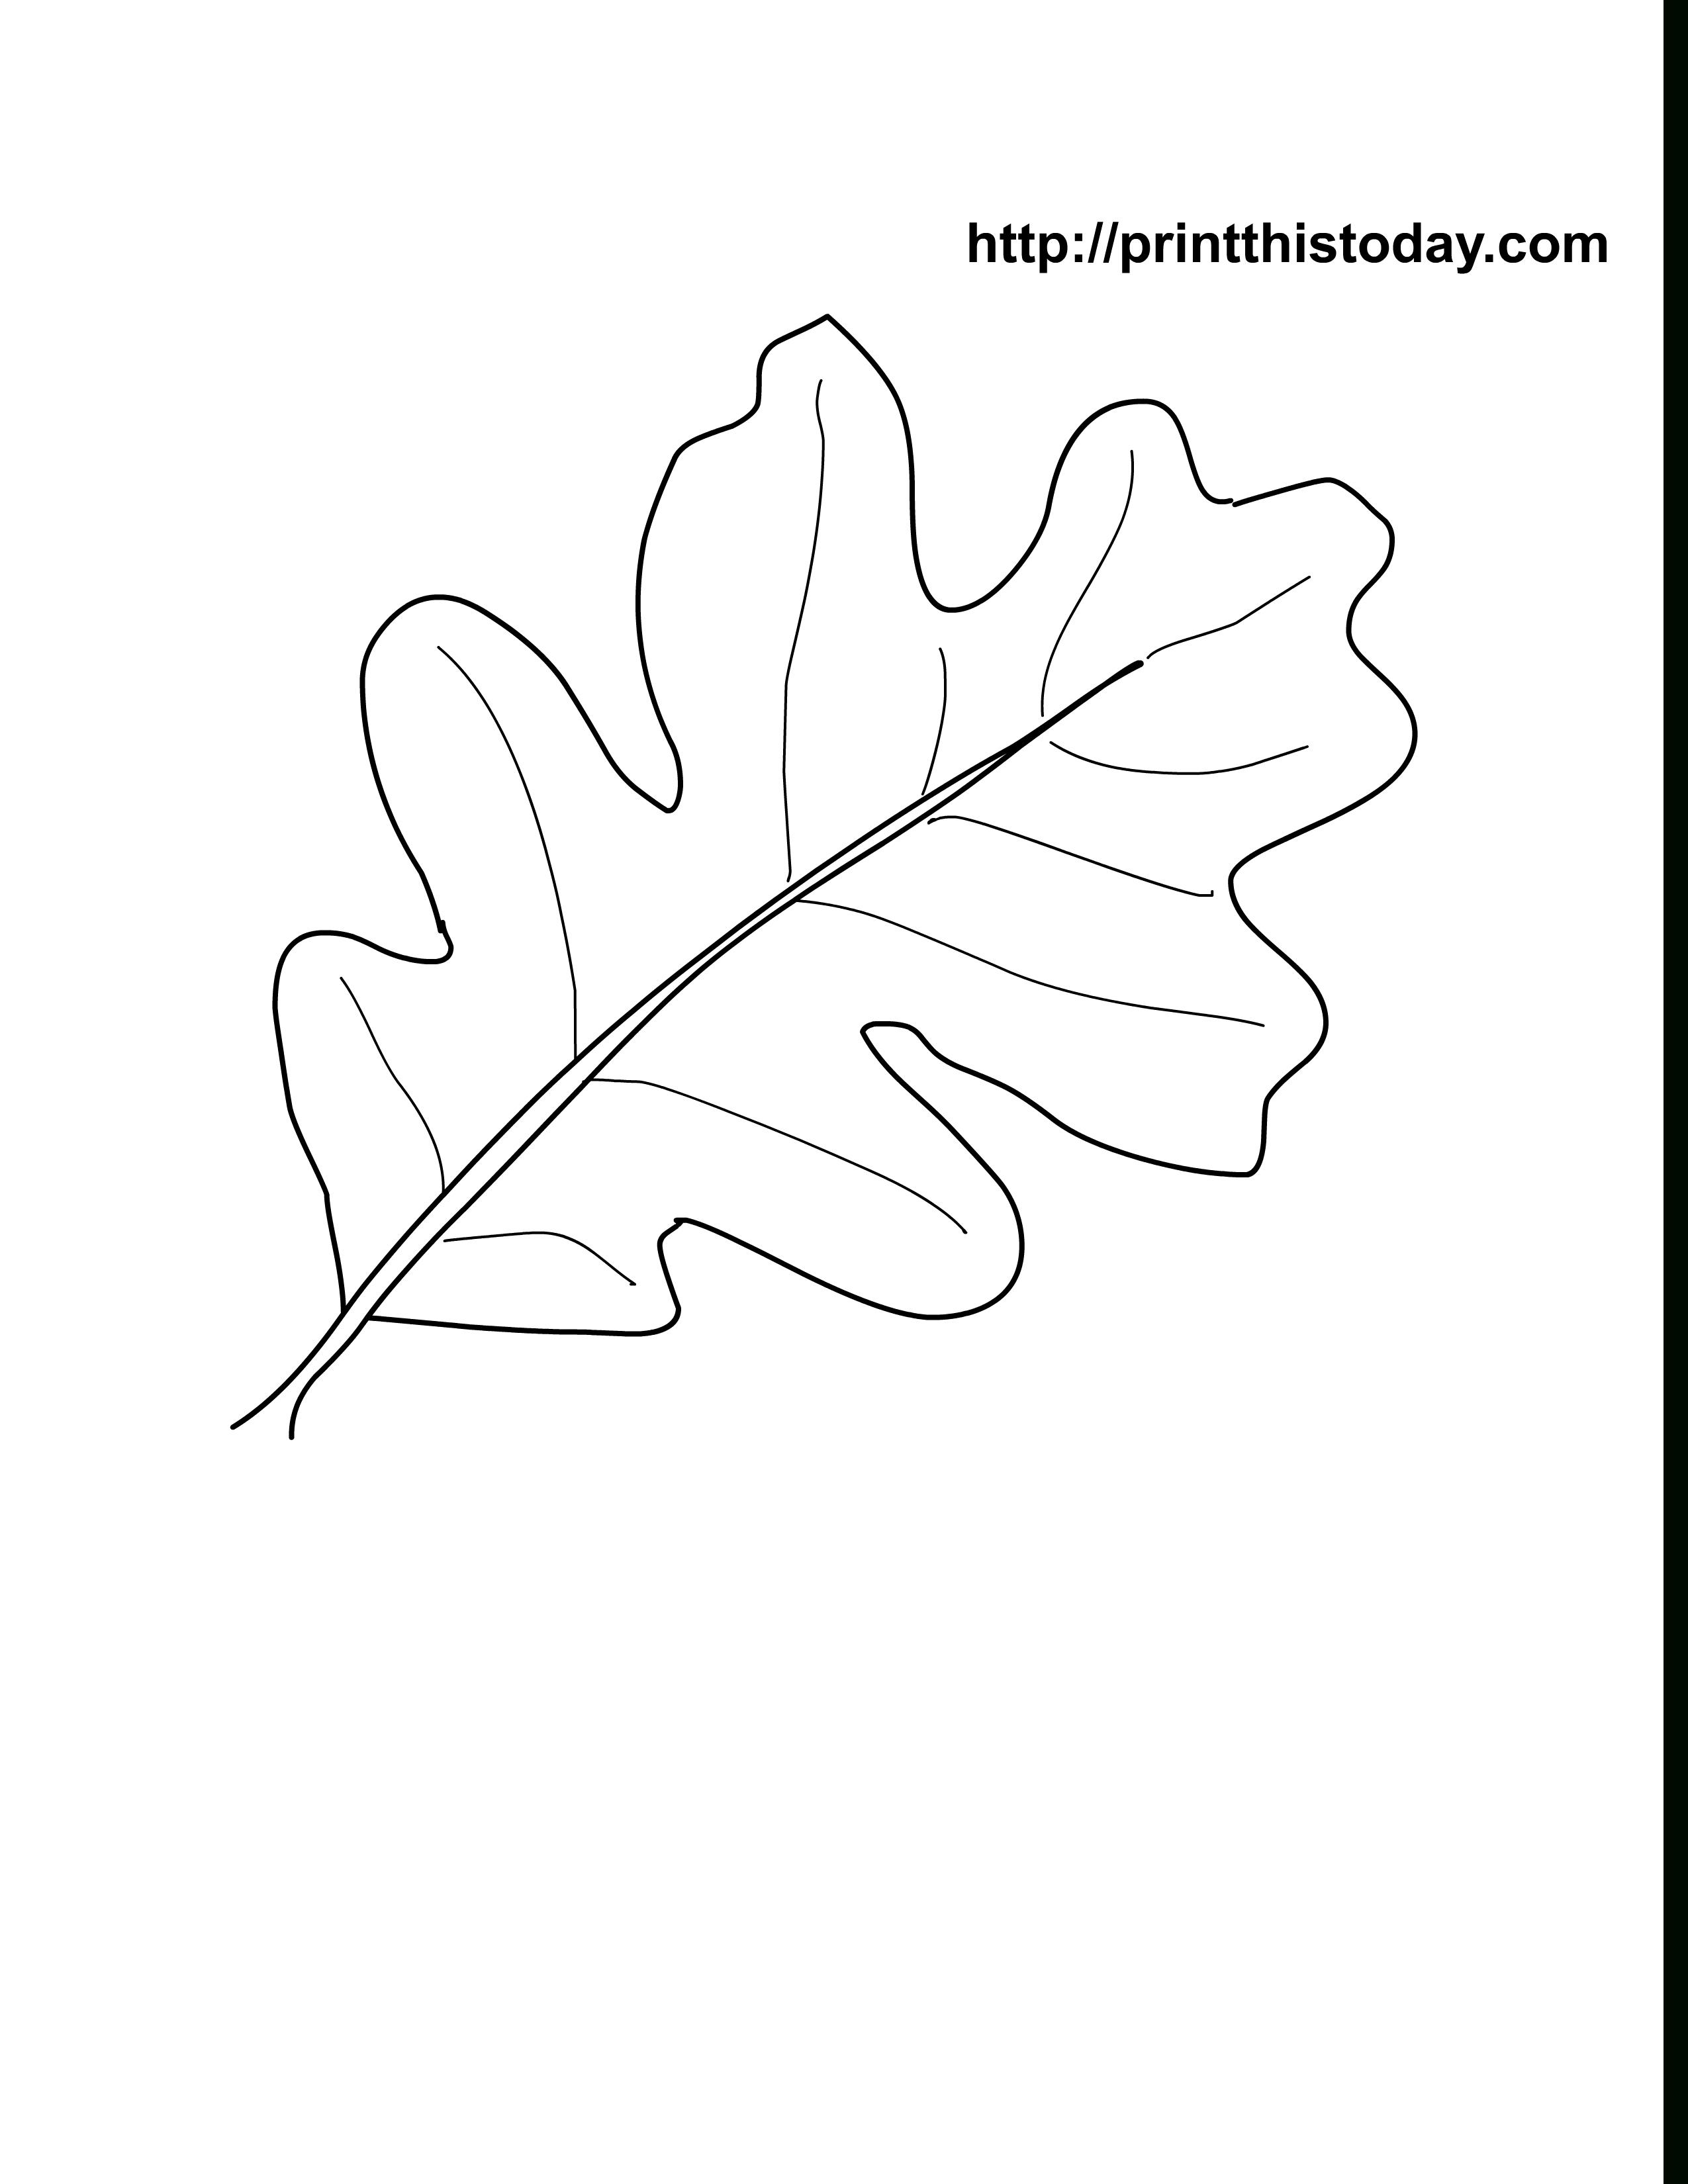 Oak Leaves Coloring Pages Printable | Craft Ideas | Leaf Coloring - Free Printable Leaf Template